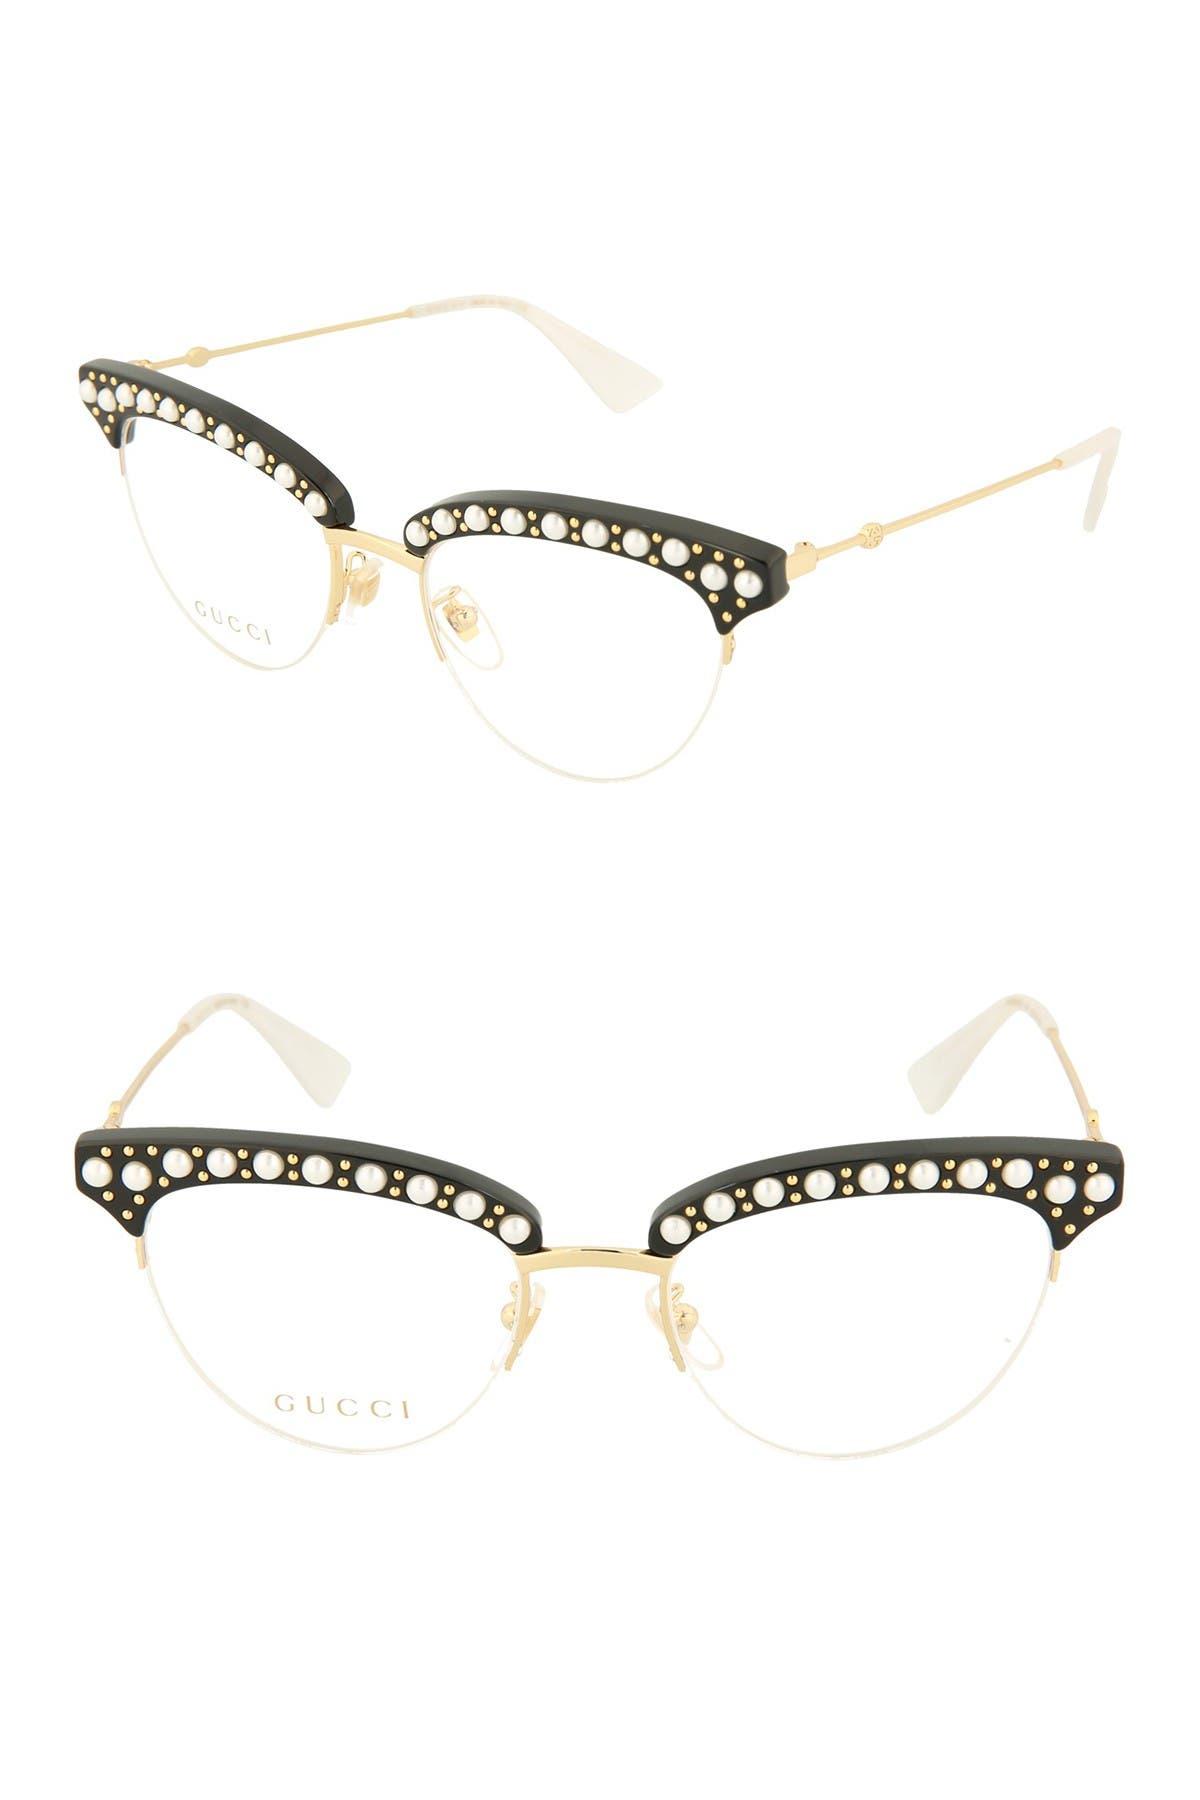 Image of GUCCI 50mm Embellished Cat Eye Optical Glasses